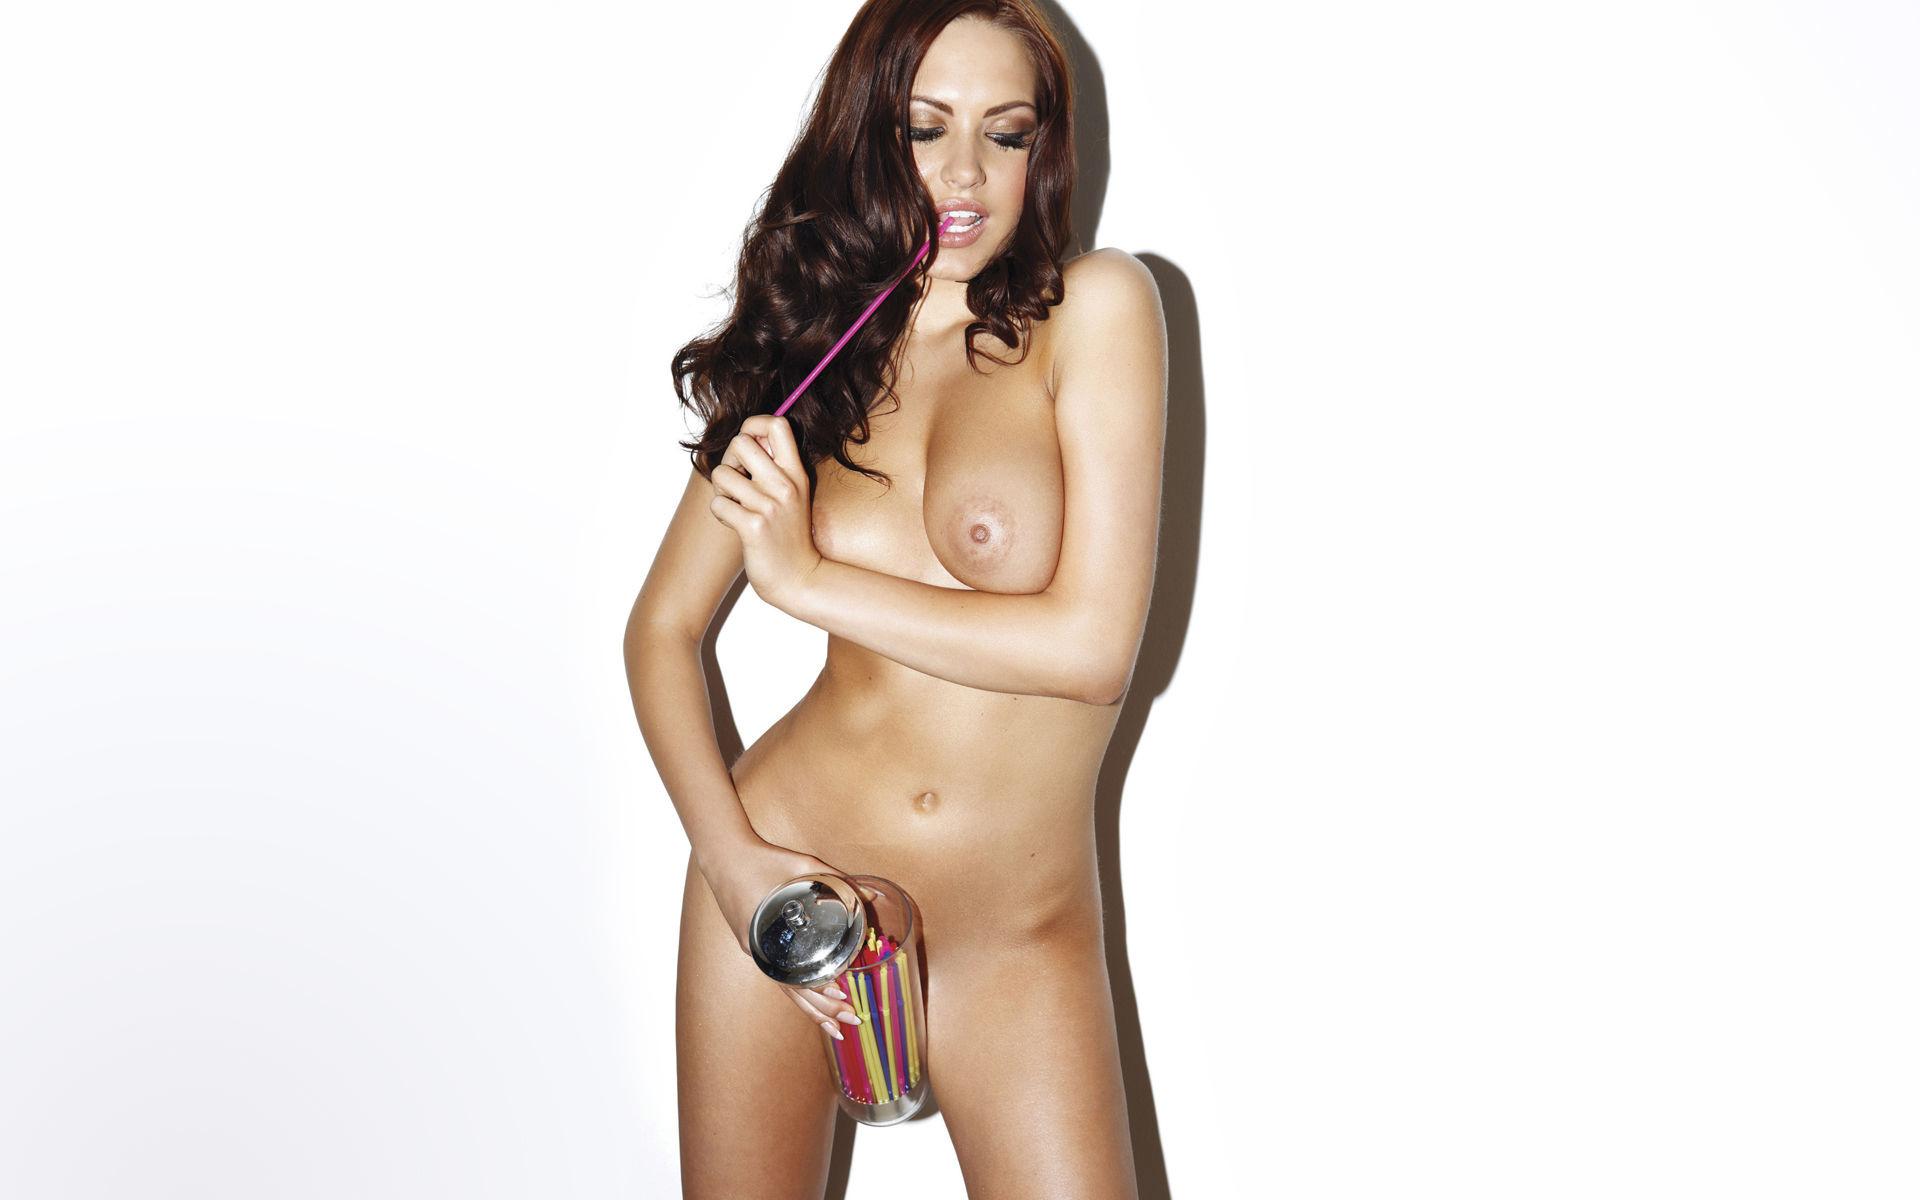 naked (51 photos), Hot Celebrity photos